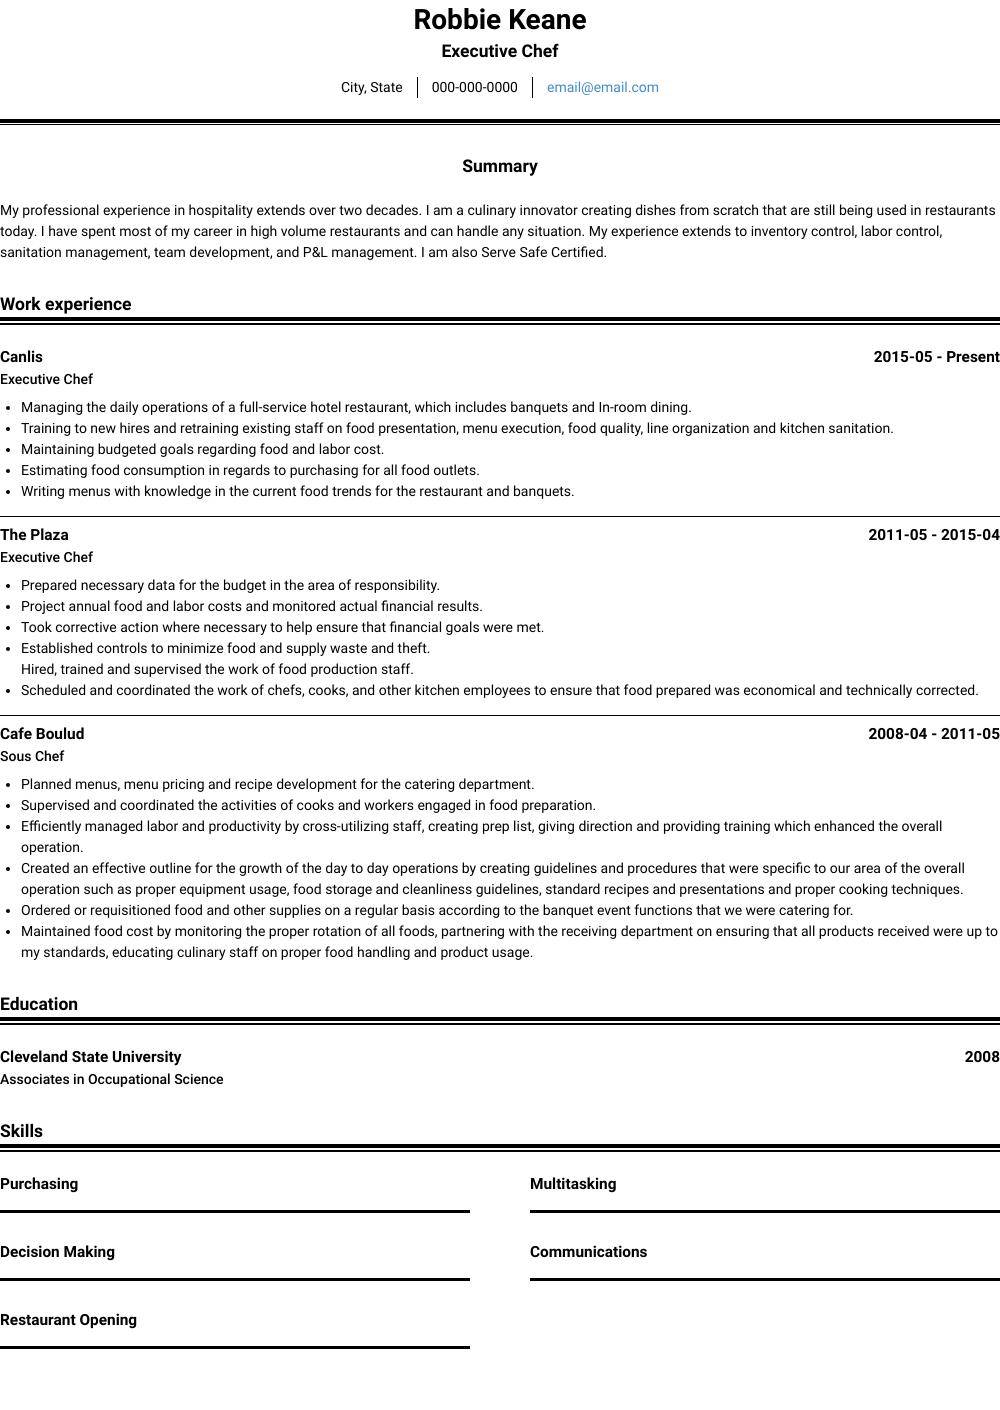 Chef Resume Samples Templates Visualcv